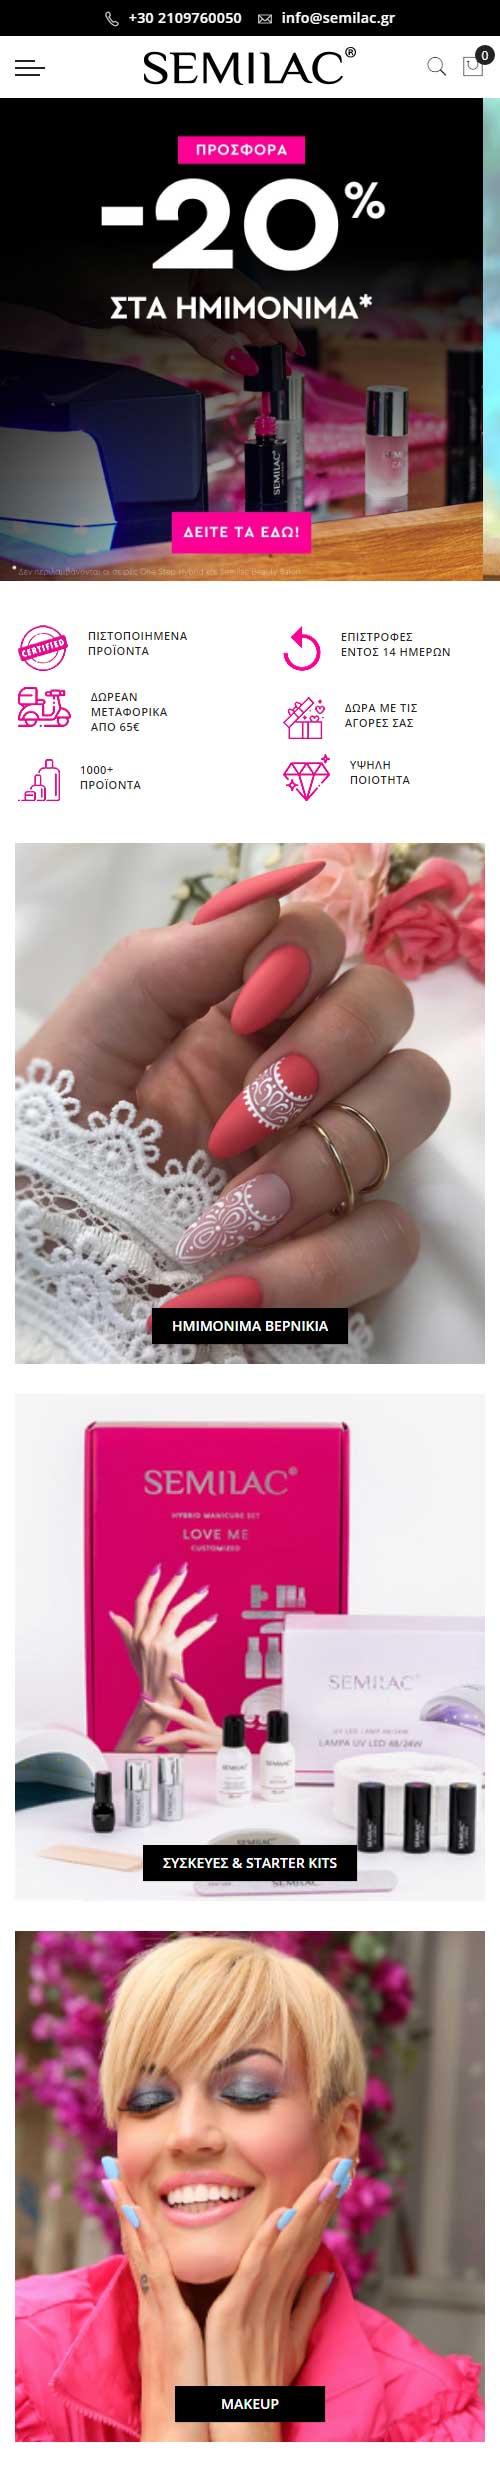 Semilac resp 01